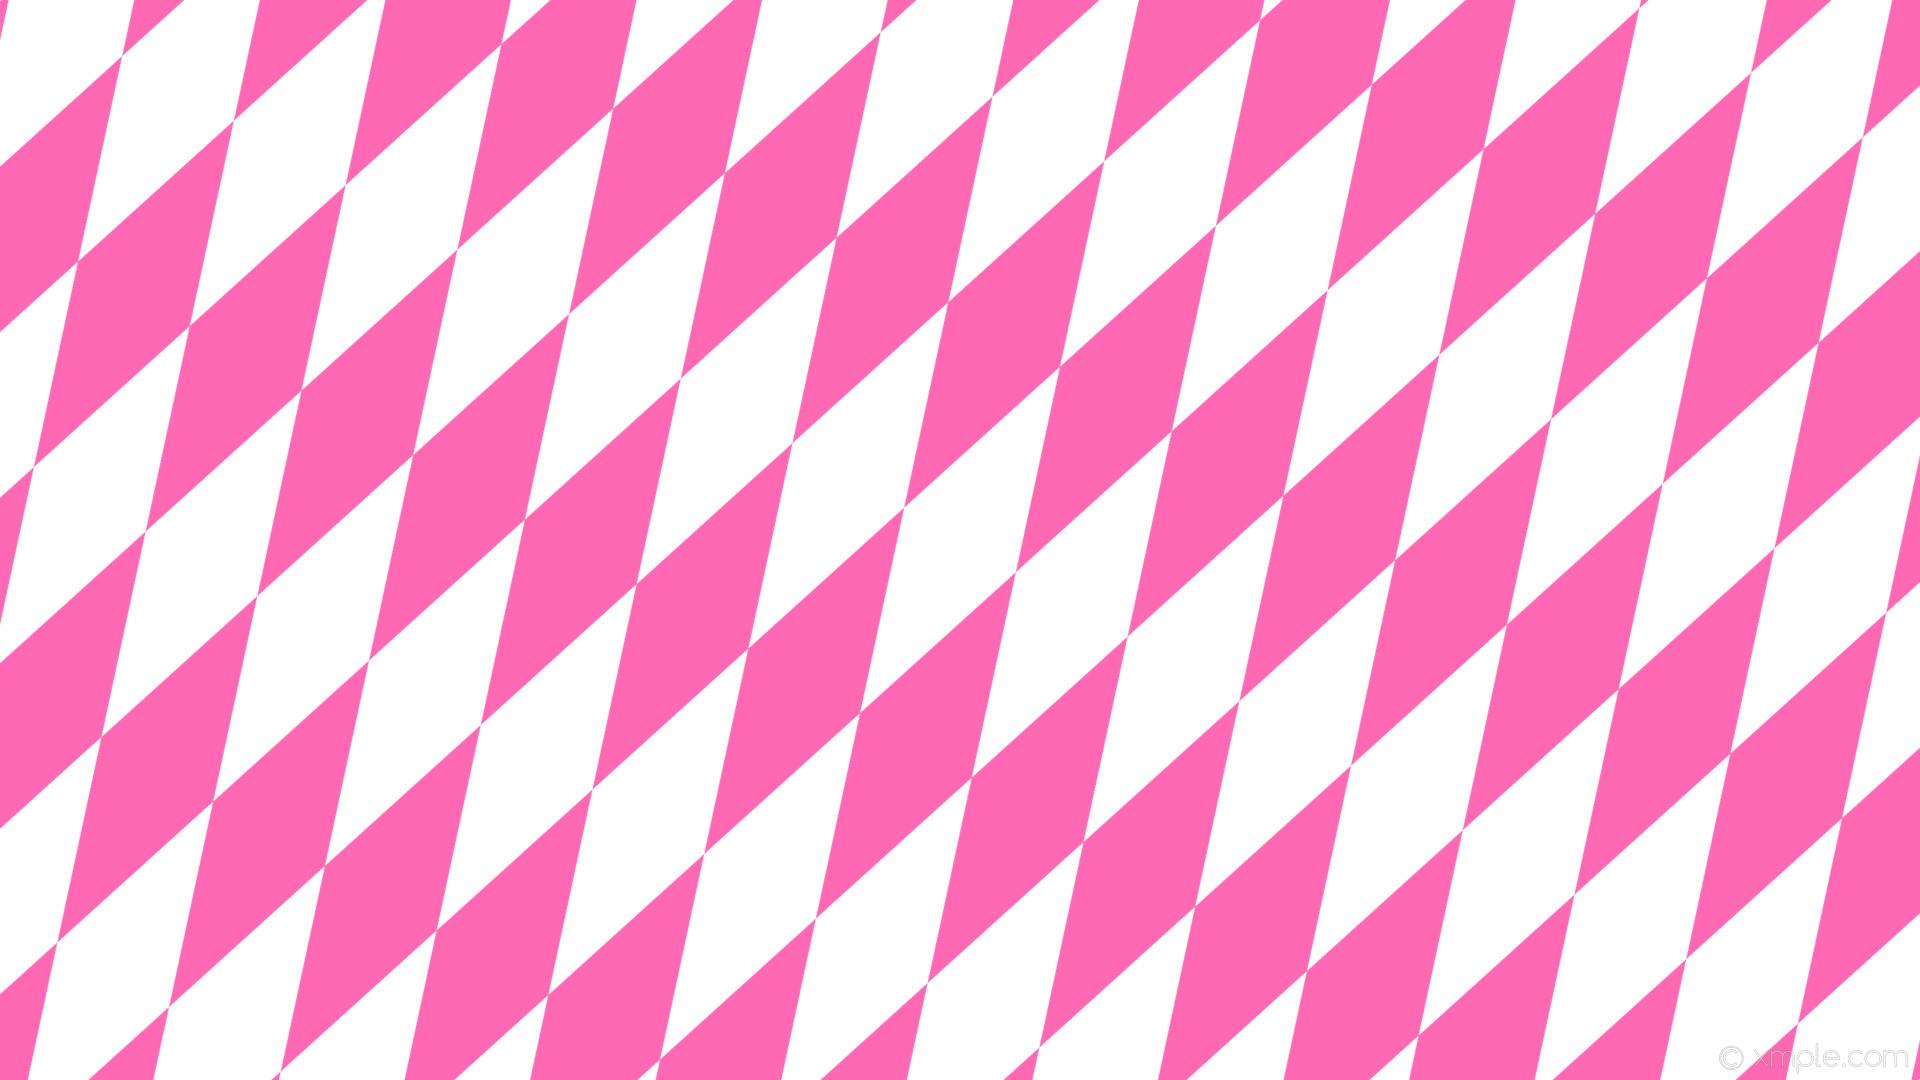 wallpaper pink white diamond lozenge rhombus hot pink #ffffff #ff69b4 60°  400px 129px